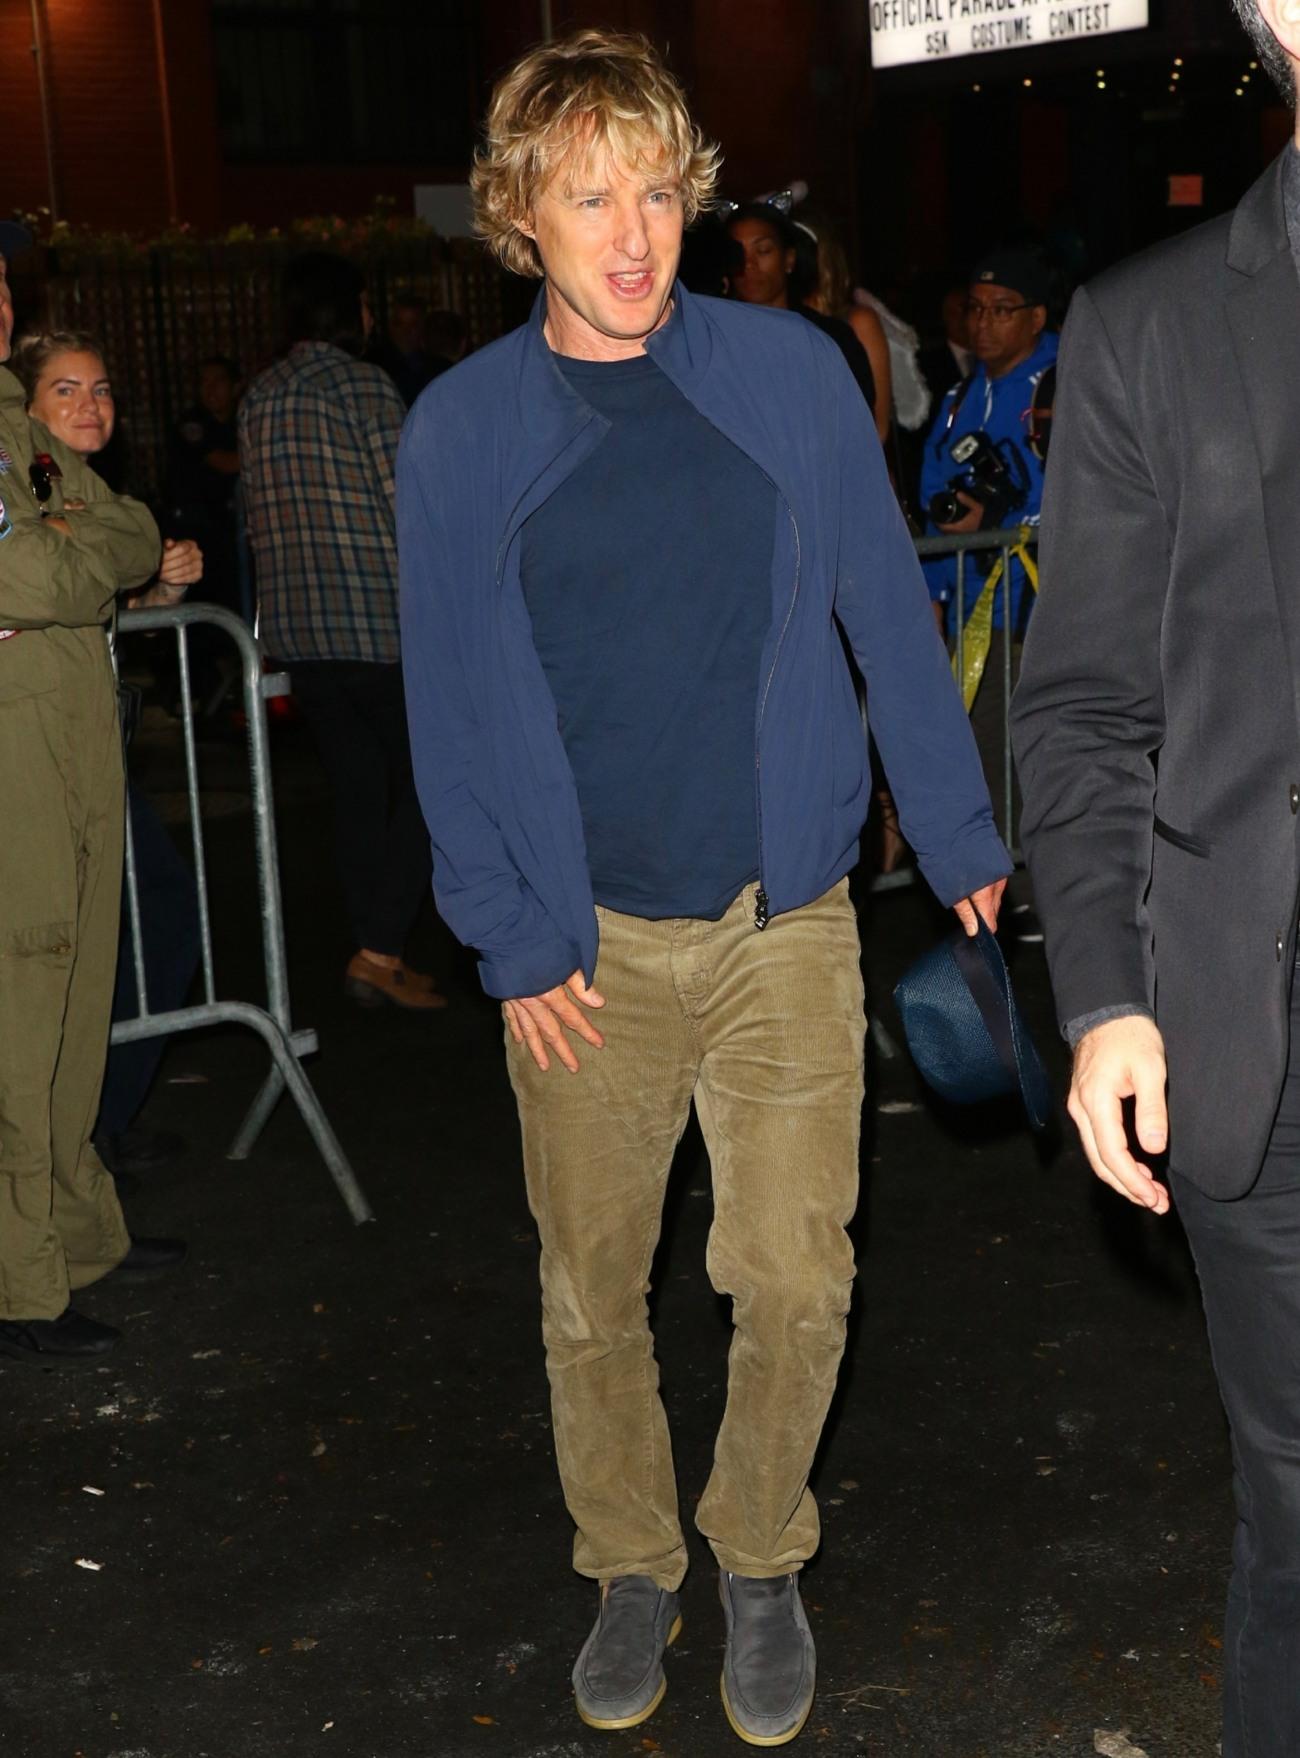 Owen Wilson skips a costume at Heidi Klum's Halloween Party